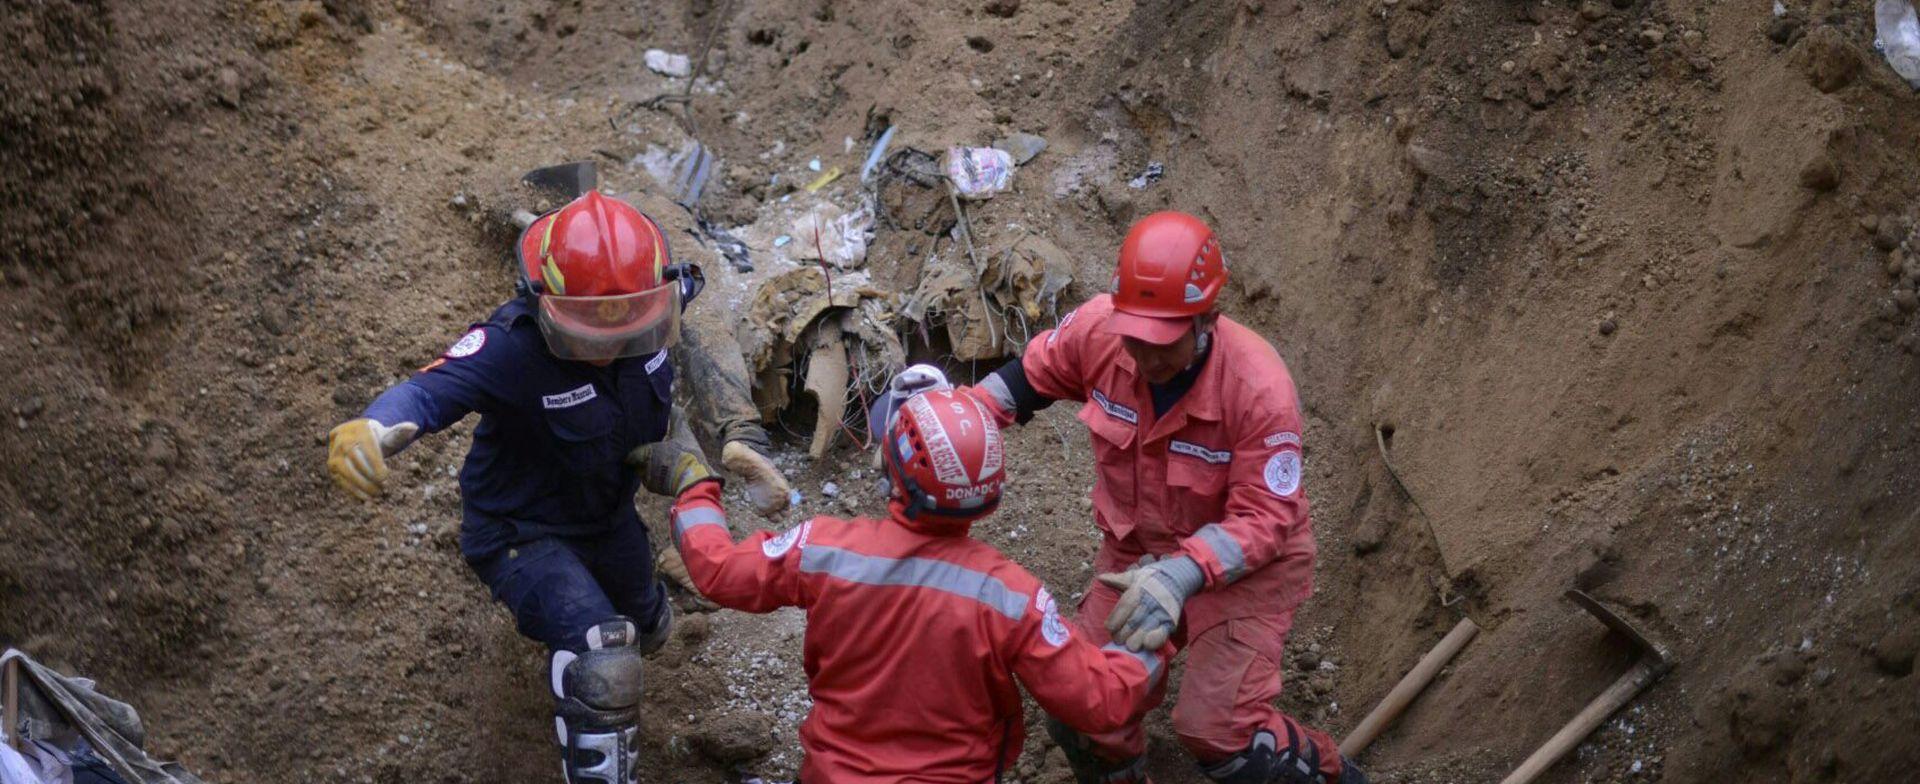 JAKE KIŠE: U Gvatemali 142 mrtvih u klizanju terena